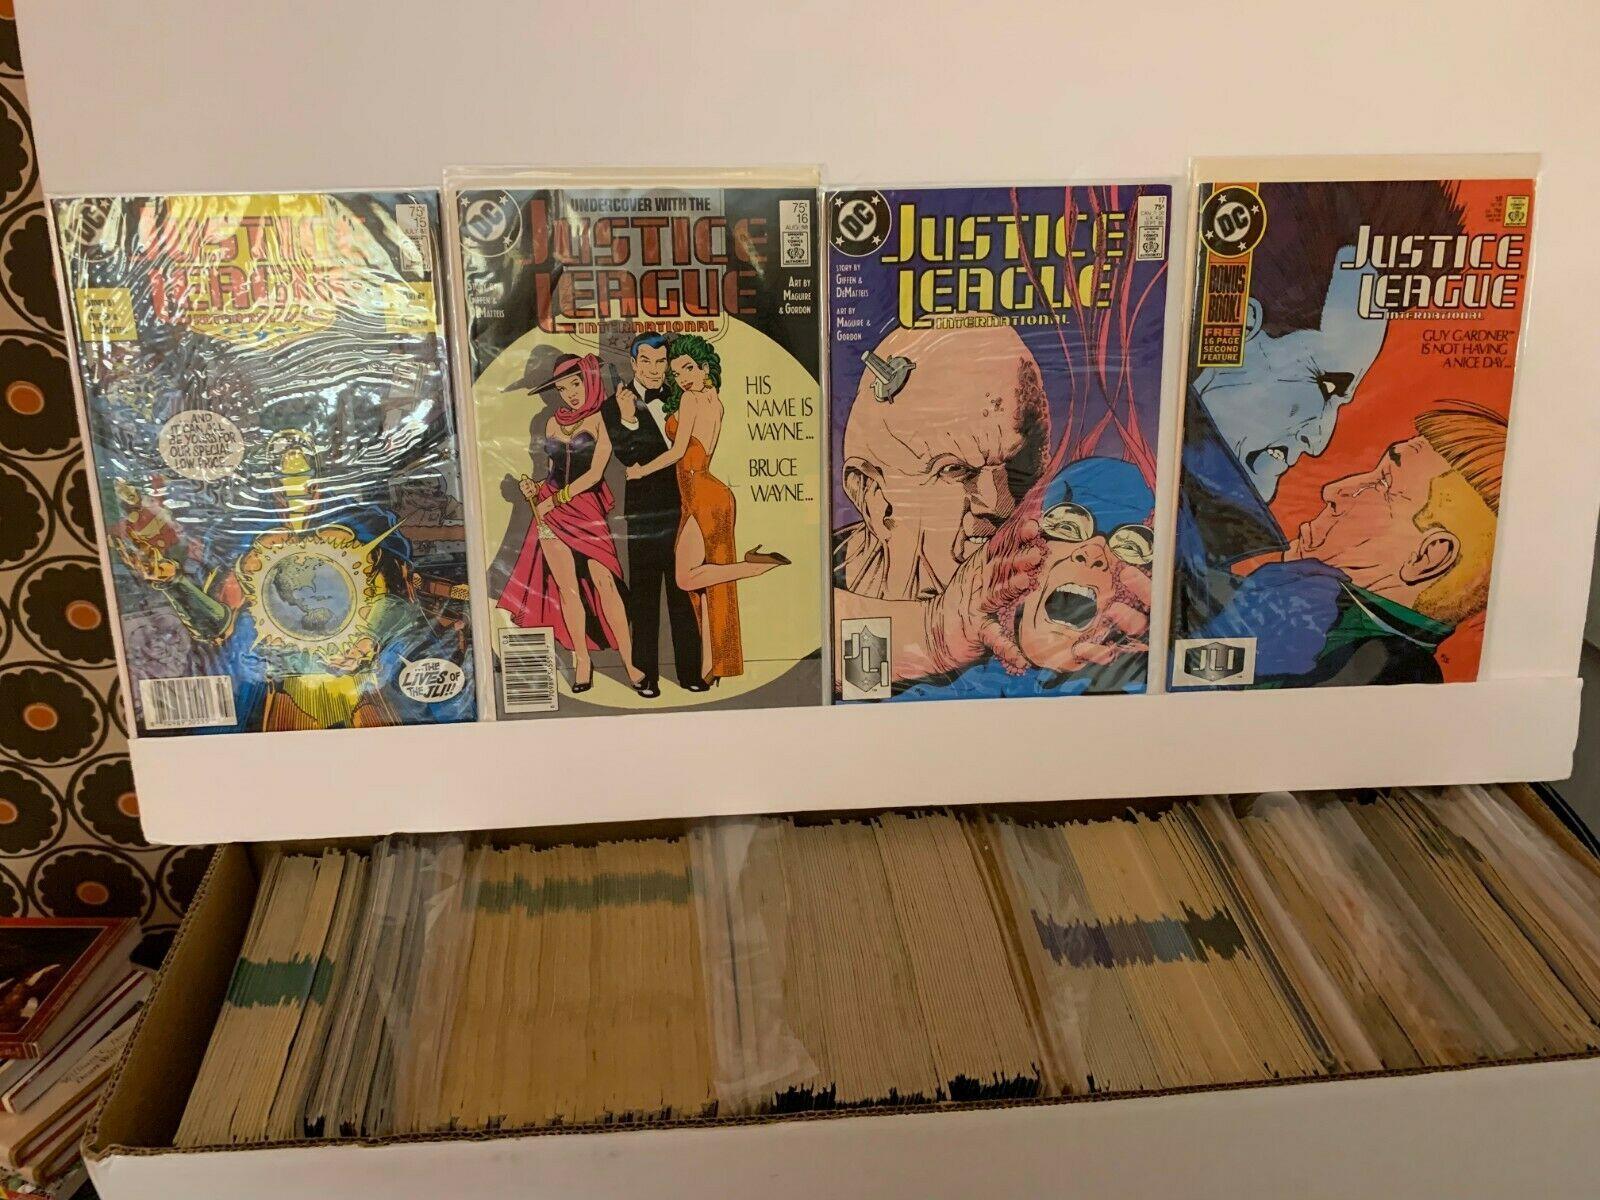 JUSTICE LEAGUE INTERNATIONAL (DC COMICS) 1987-1990, 1993-1994, 2008 VF 15 BOOKS